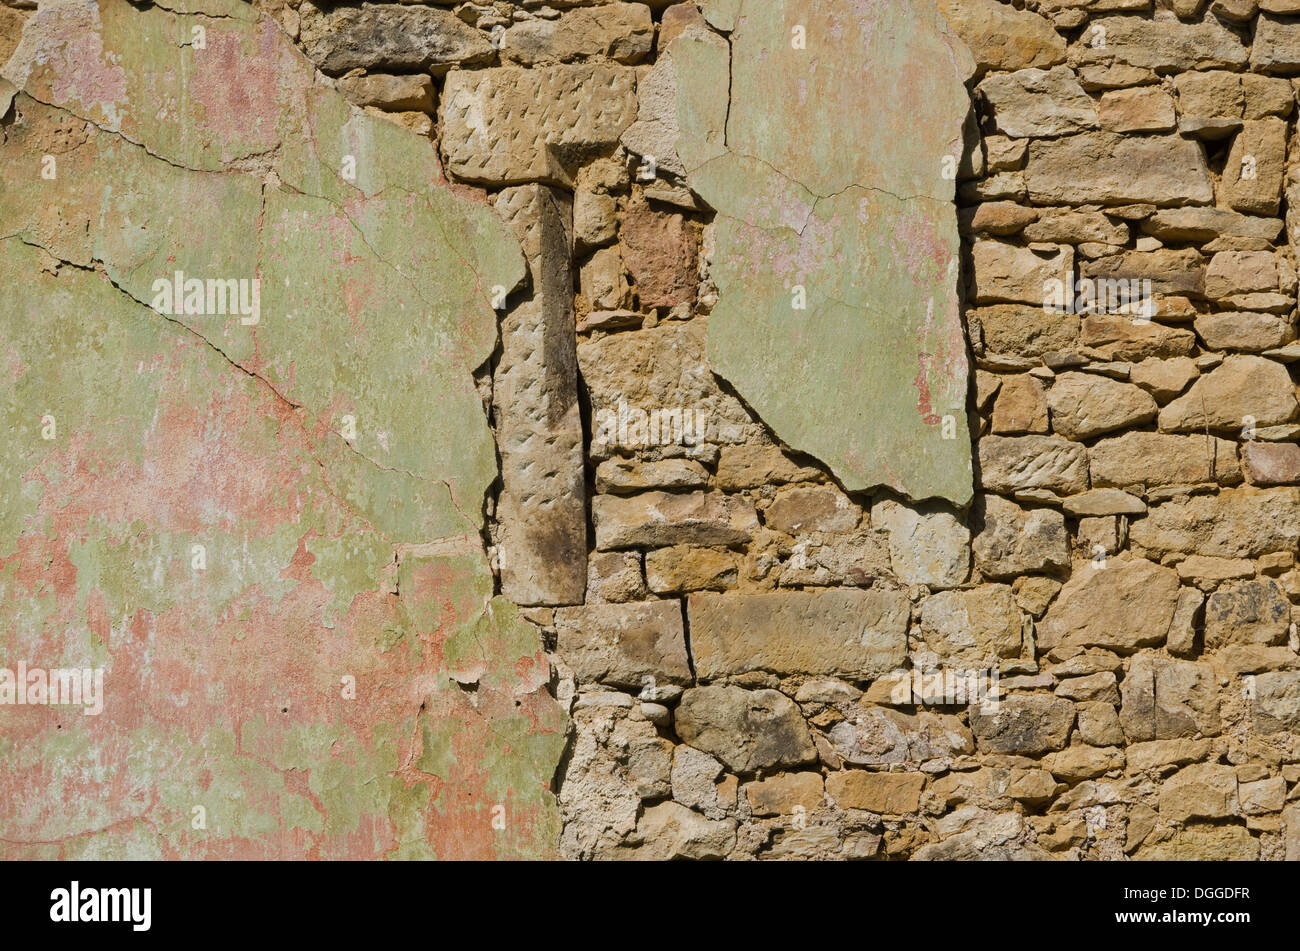 Broken wall of an old building, Zuschendorf, Saxony - Stock Image